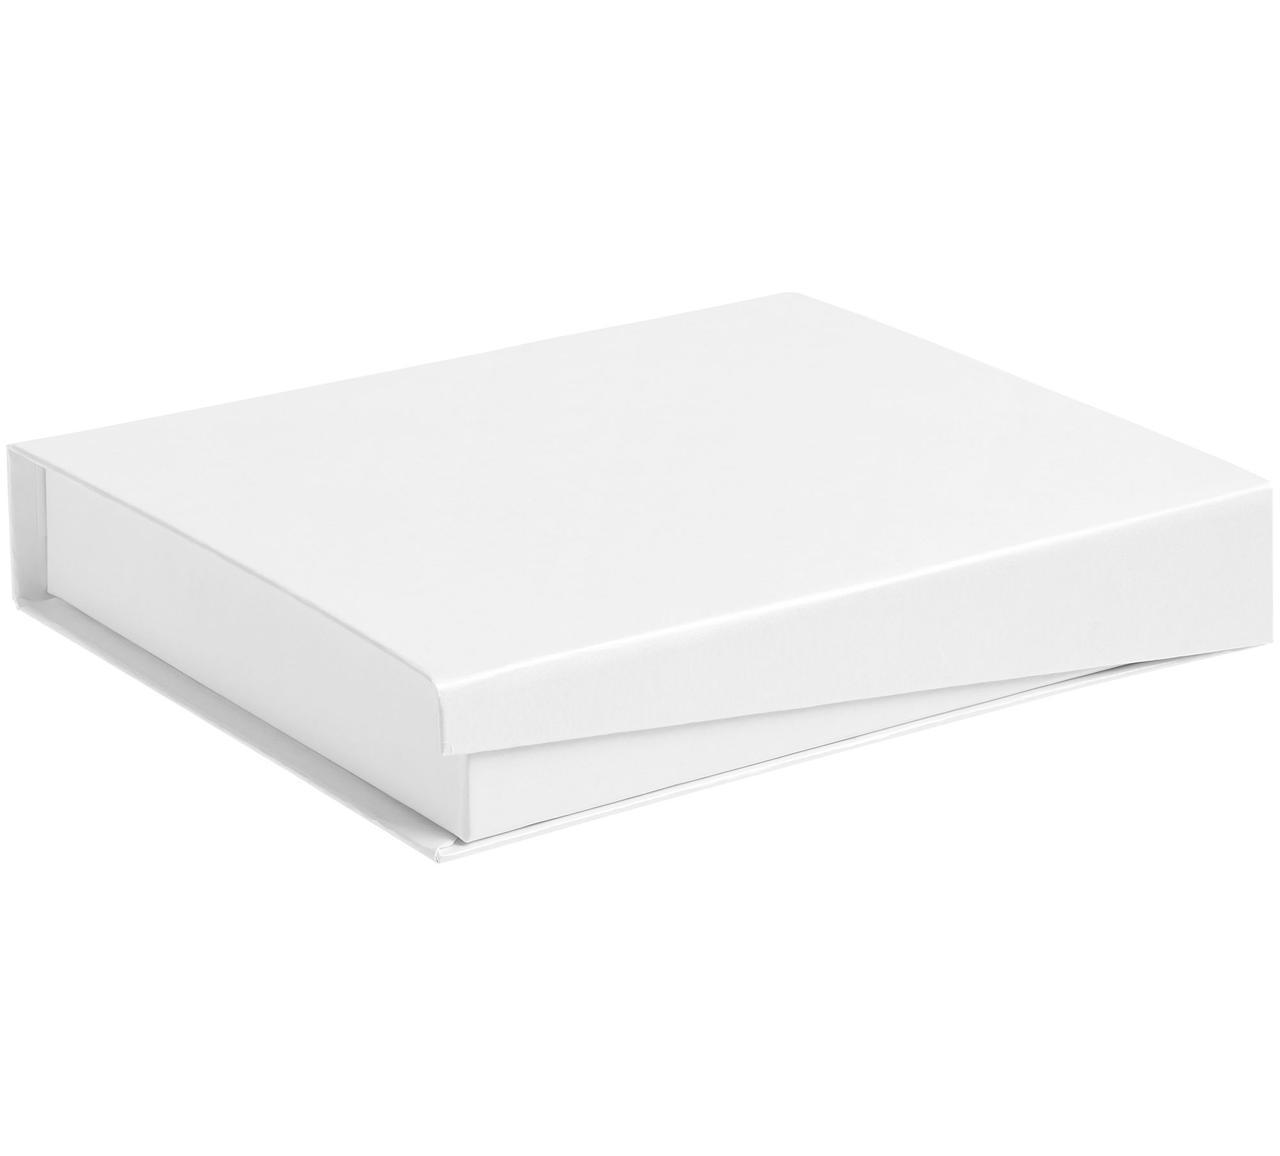 Коробка Duo под ежедневник и ручку, белая (артикул 1639.60)